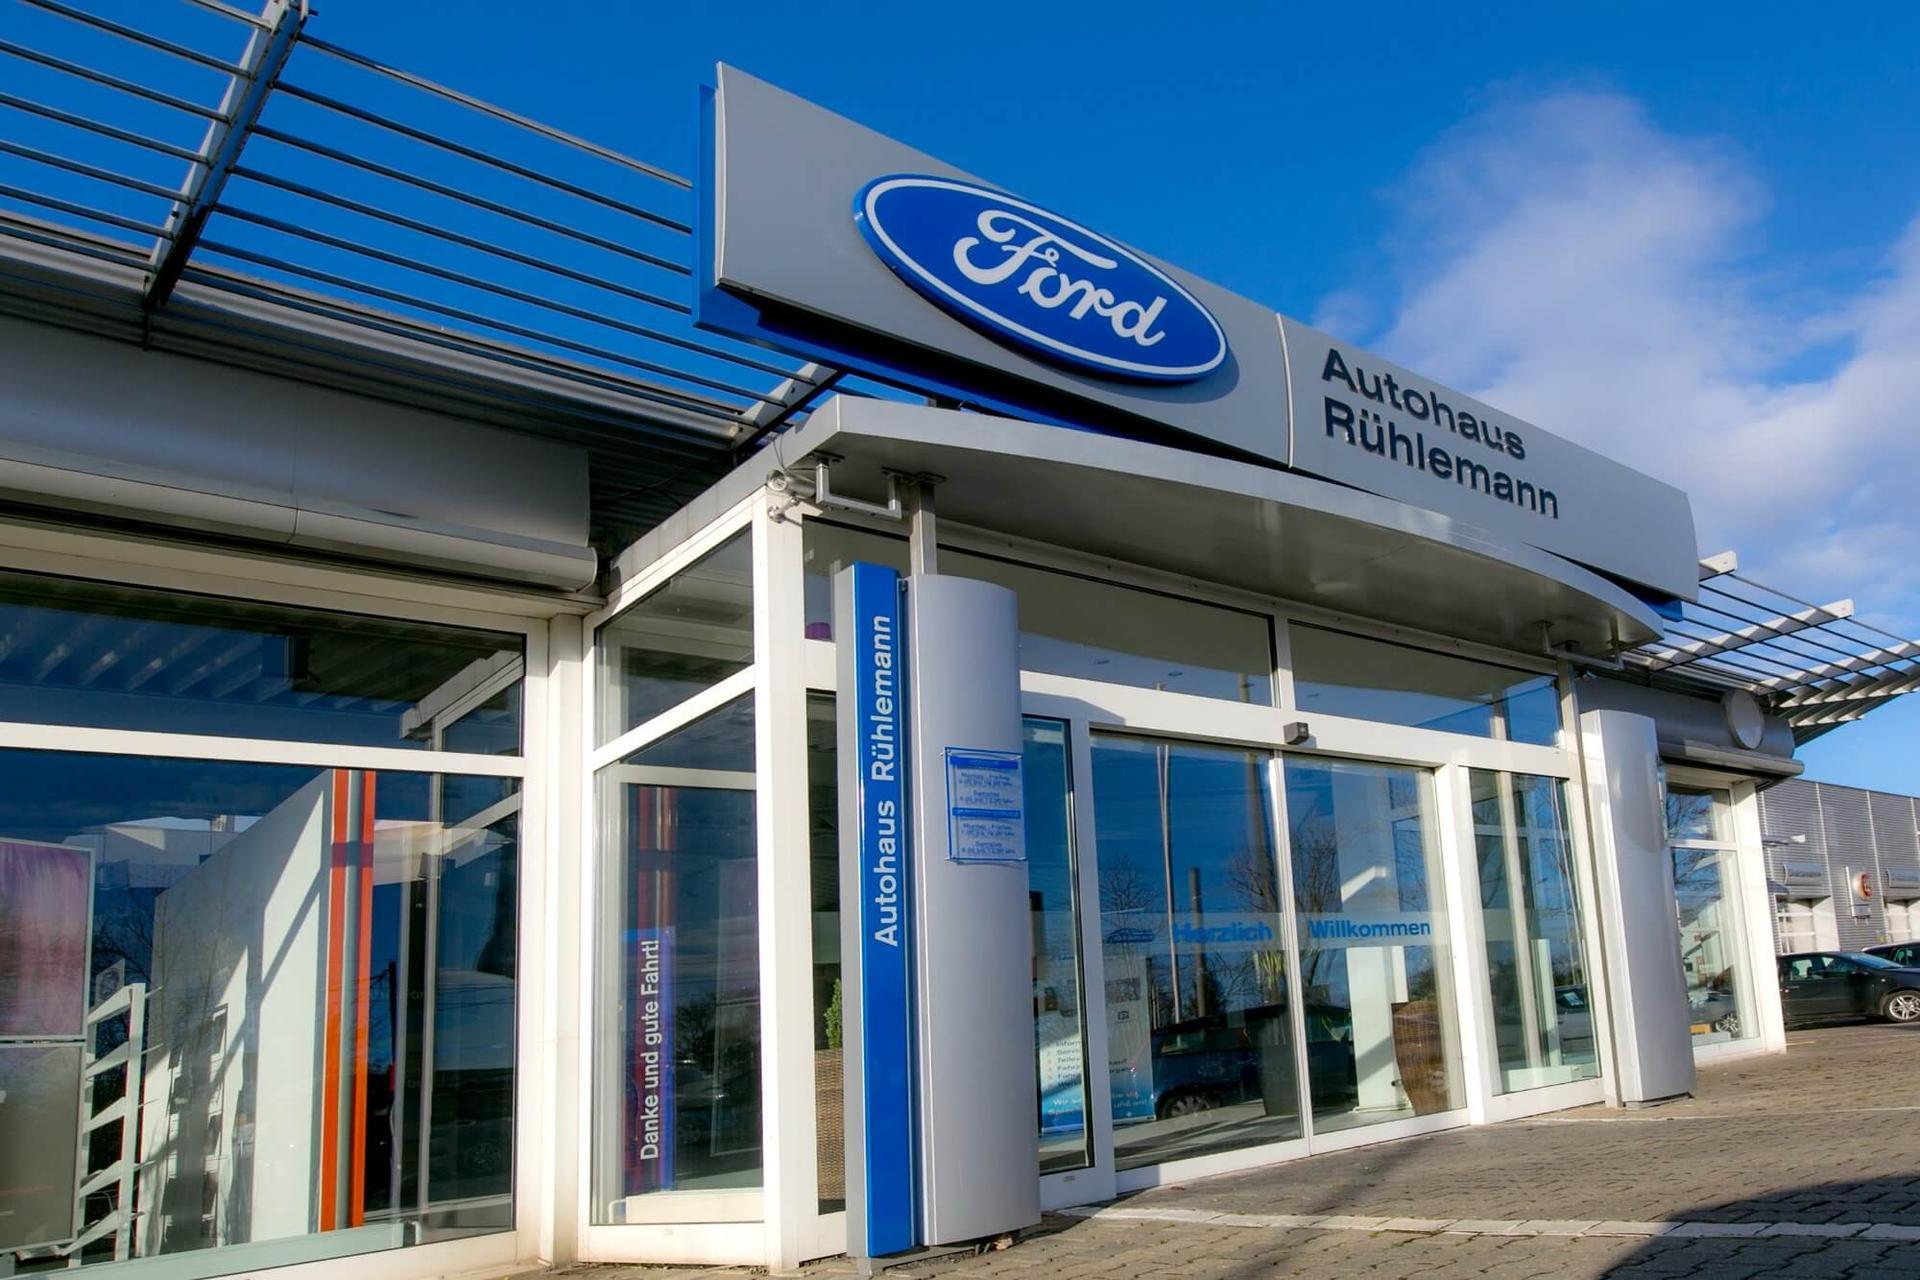 Autohaus Rühlemann GmbH Leipzig FORD Vertragshändler Kfz-Meisterbetrieb